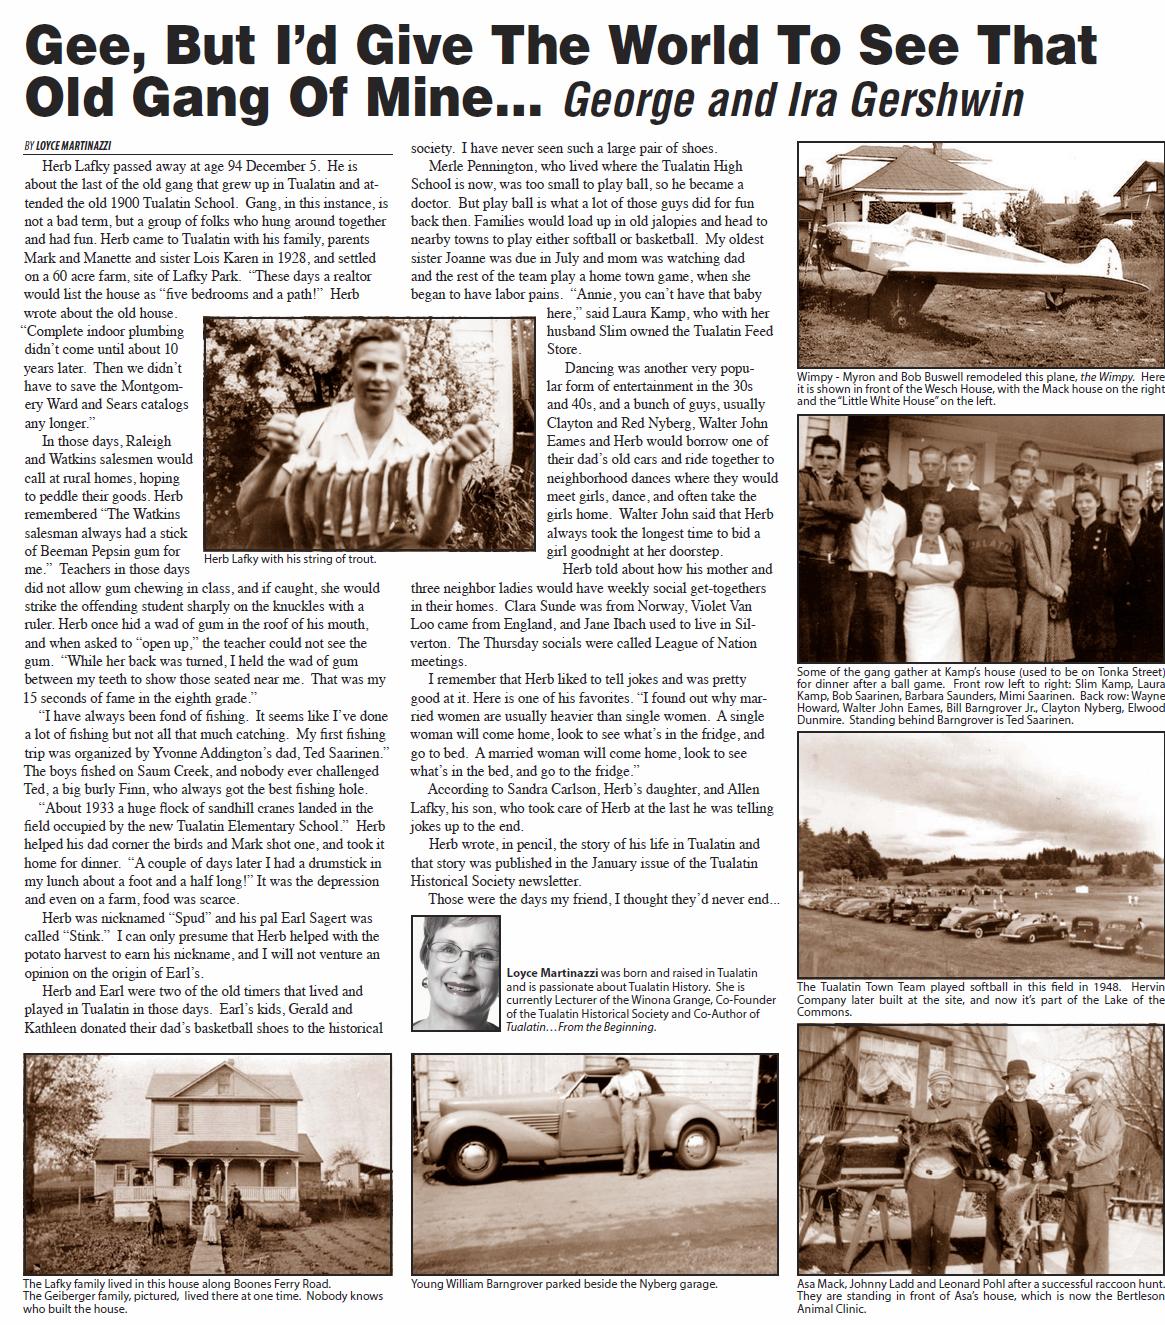 The Gershmins